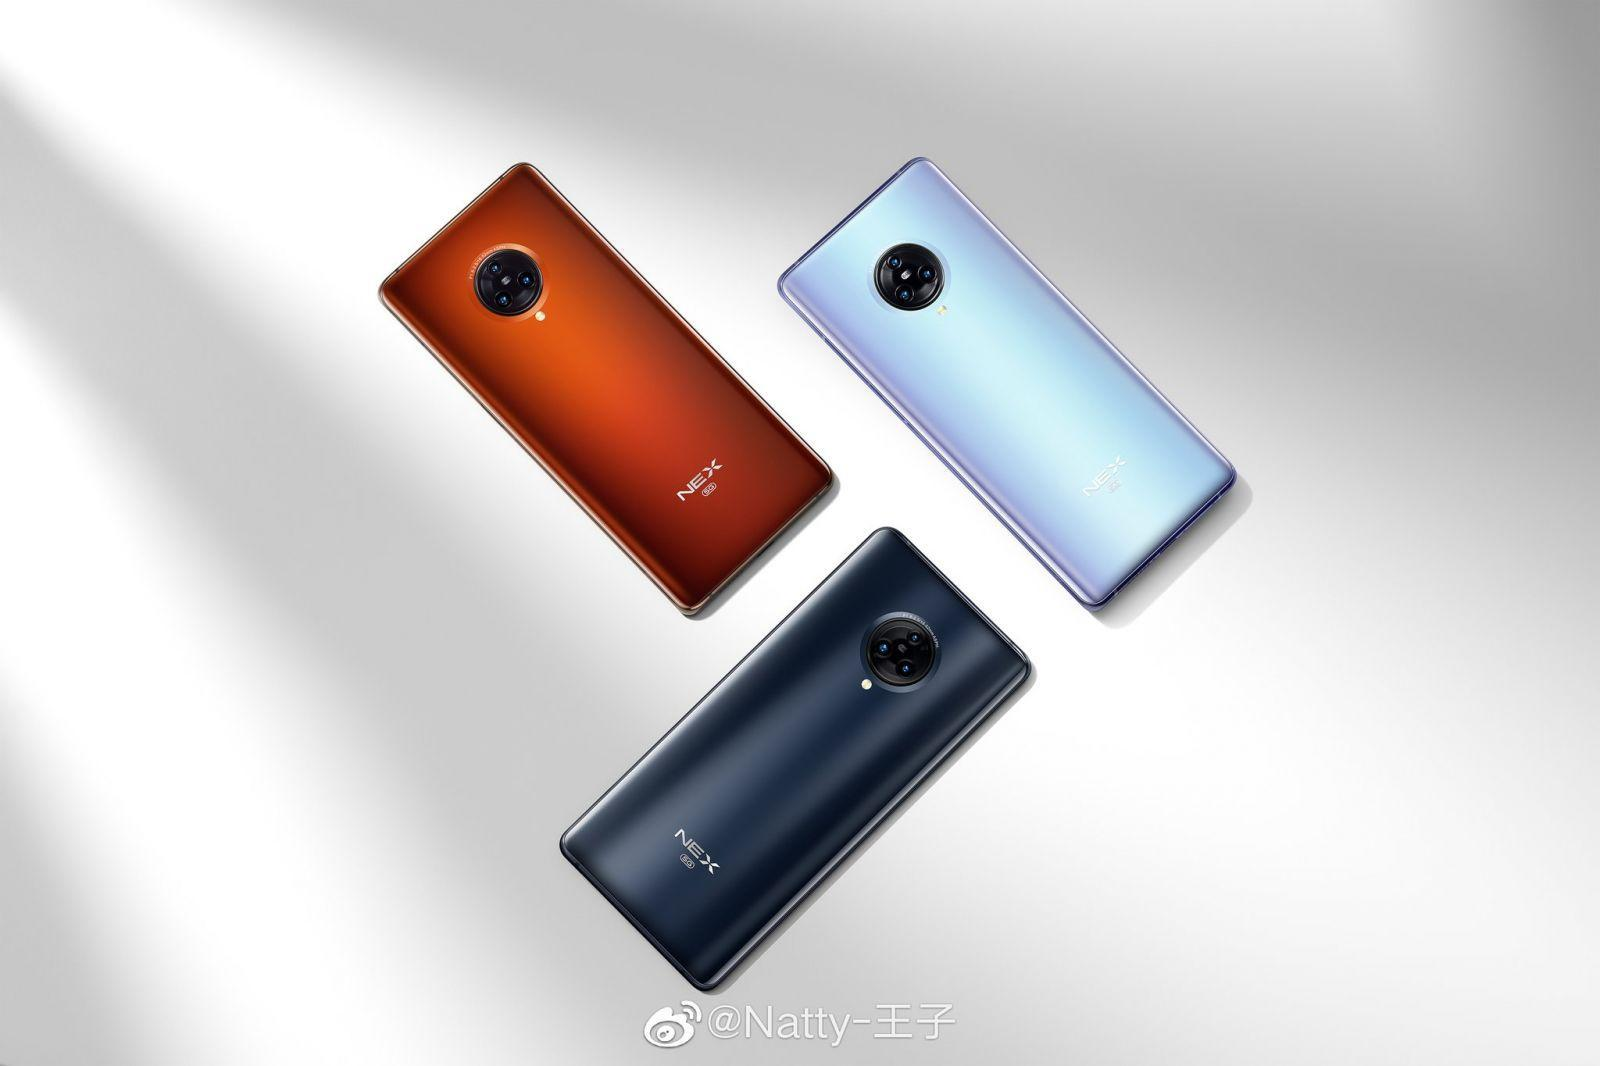 Vivo представила новый смартфон Vivo NEX 3S 5G (esuywxpwoaale n large)